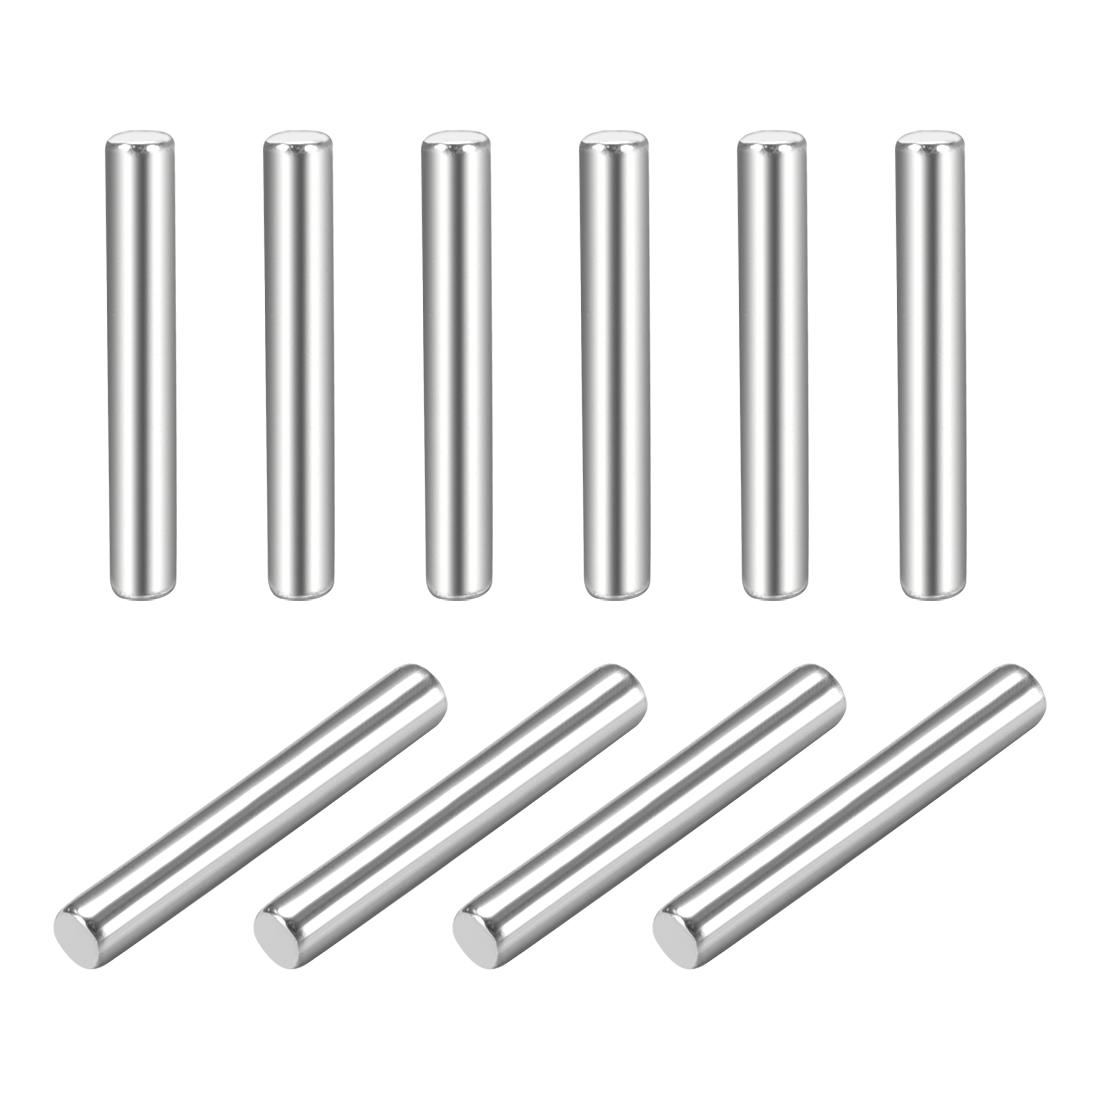 10Pcs 1.5mm x 10mm Dowel Pin 304 Stainless Steel Shelf Support Pin Fasten